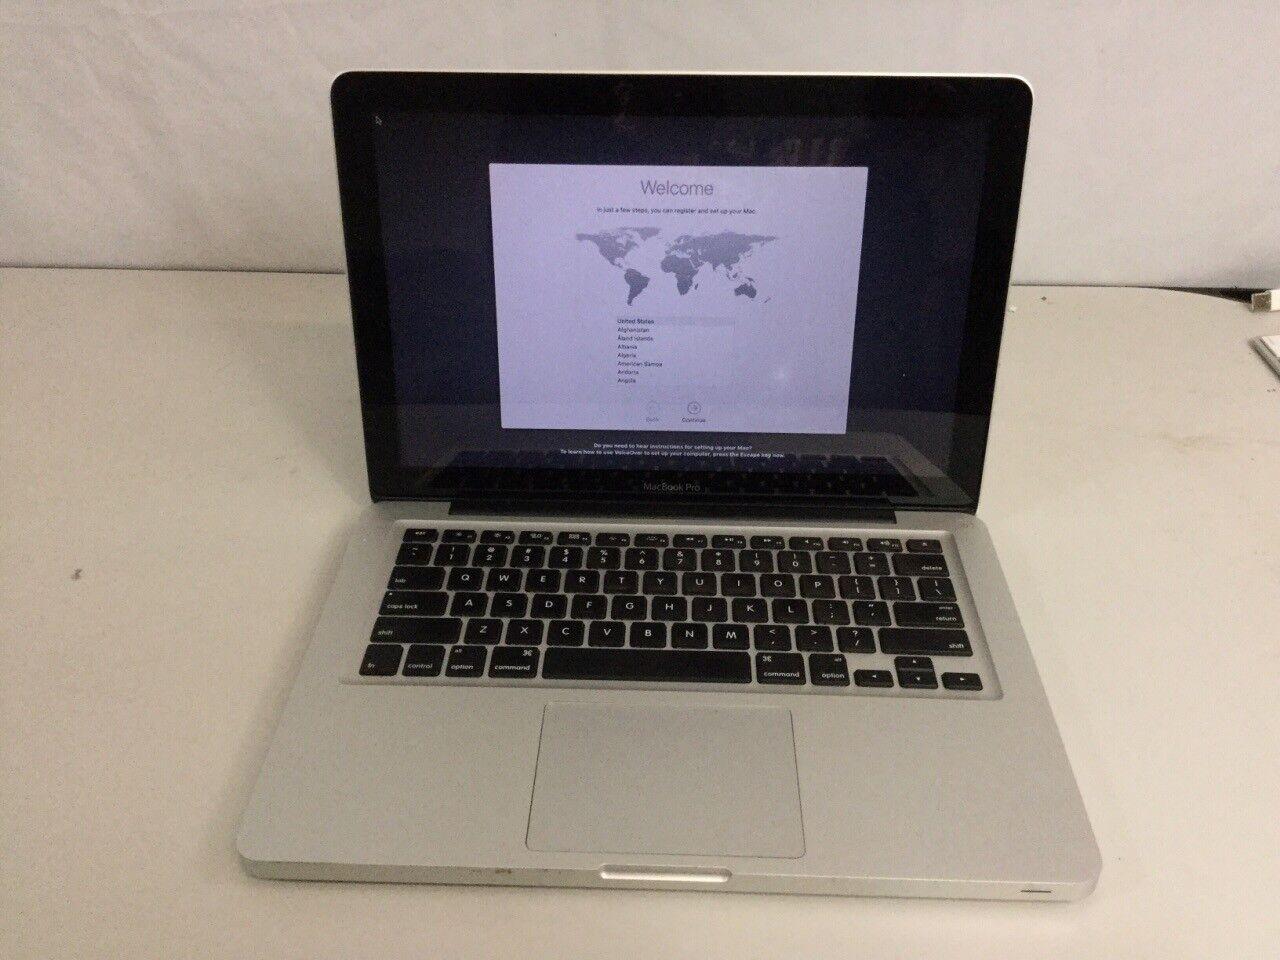 "Apple MacBook Pro 13.3"" Laptop MD101LL/A (2012) 2.5GHz i5 4GB 500GB HDD"